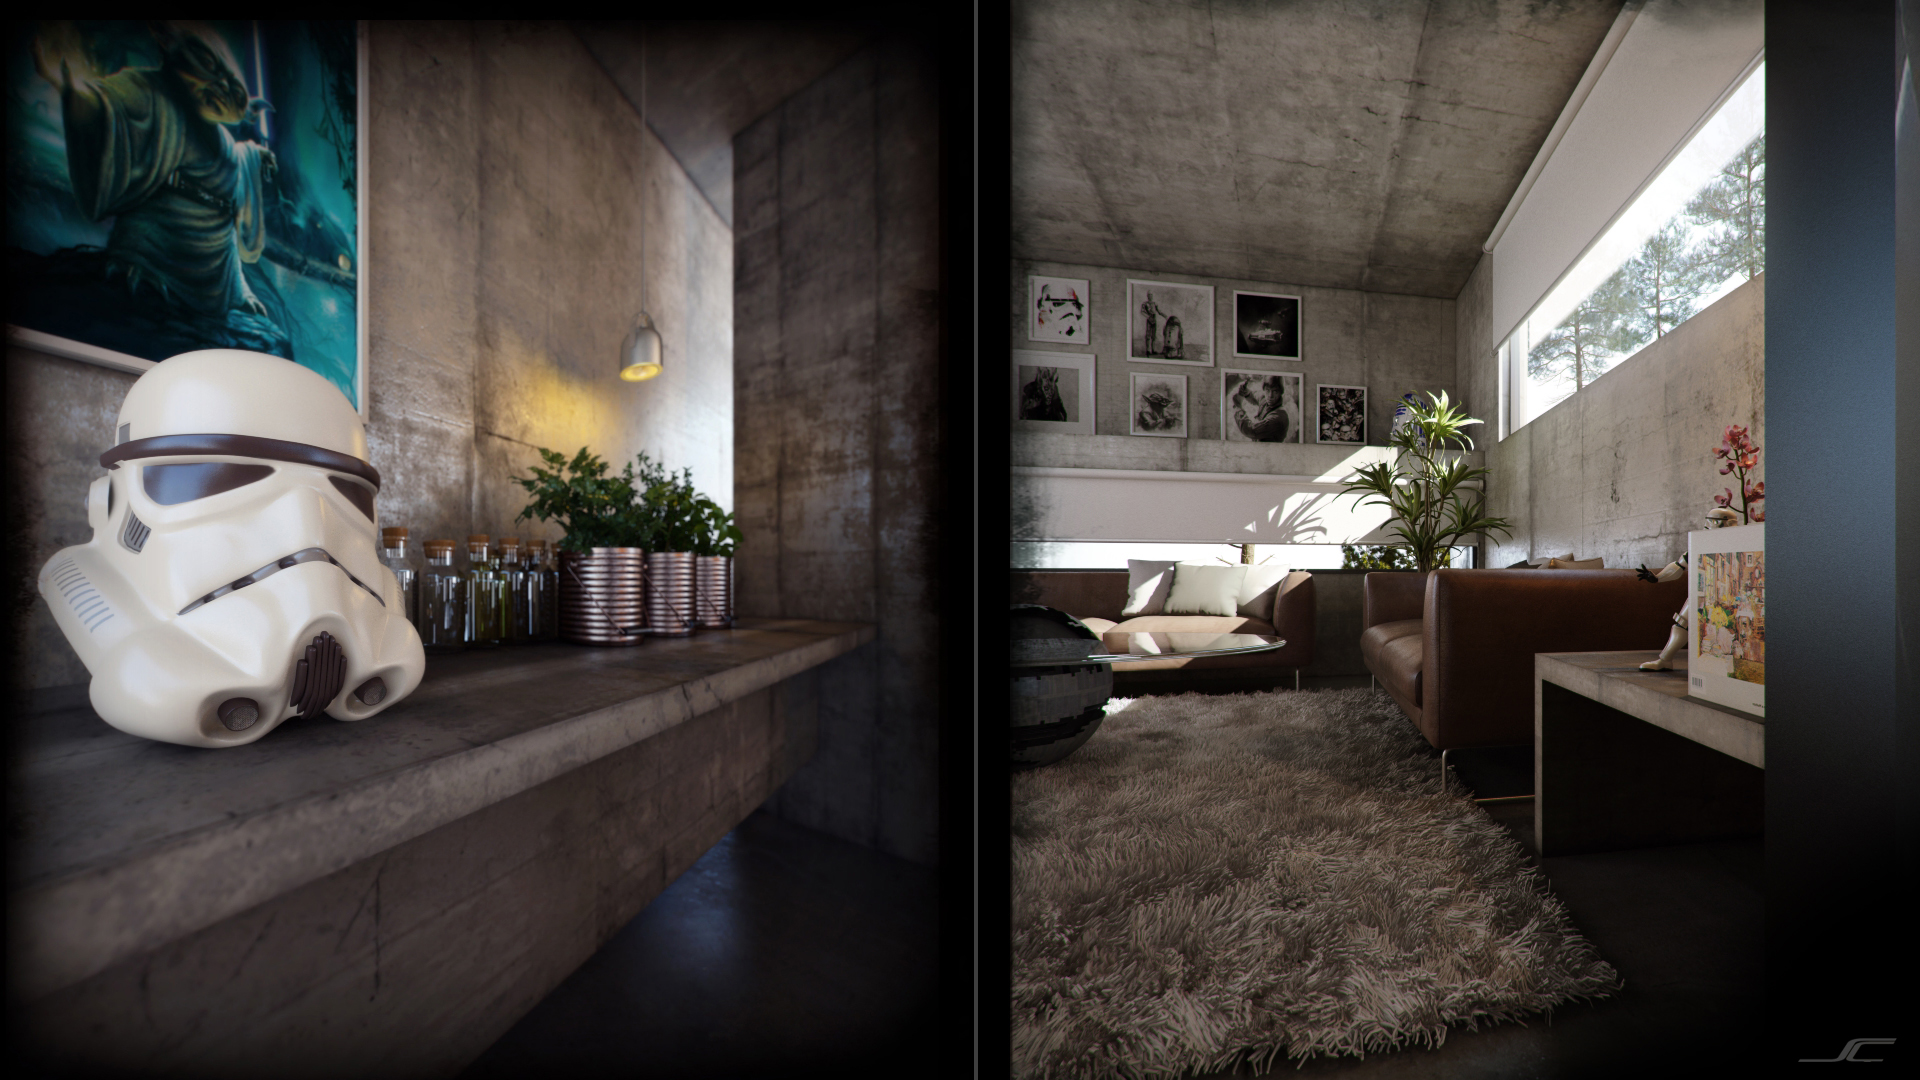 JD House by xsekox